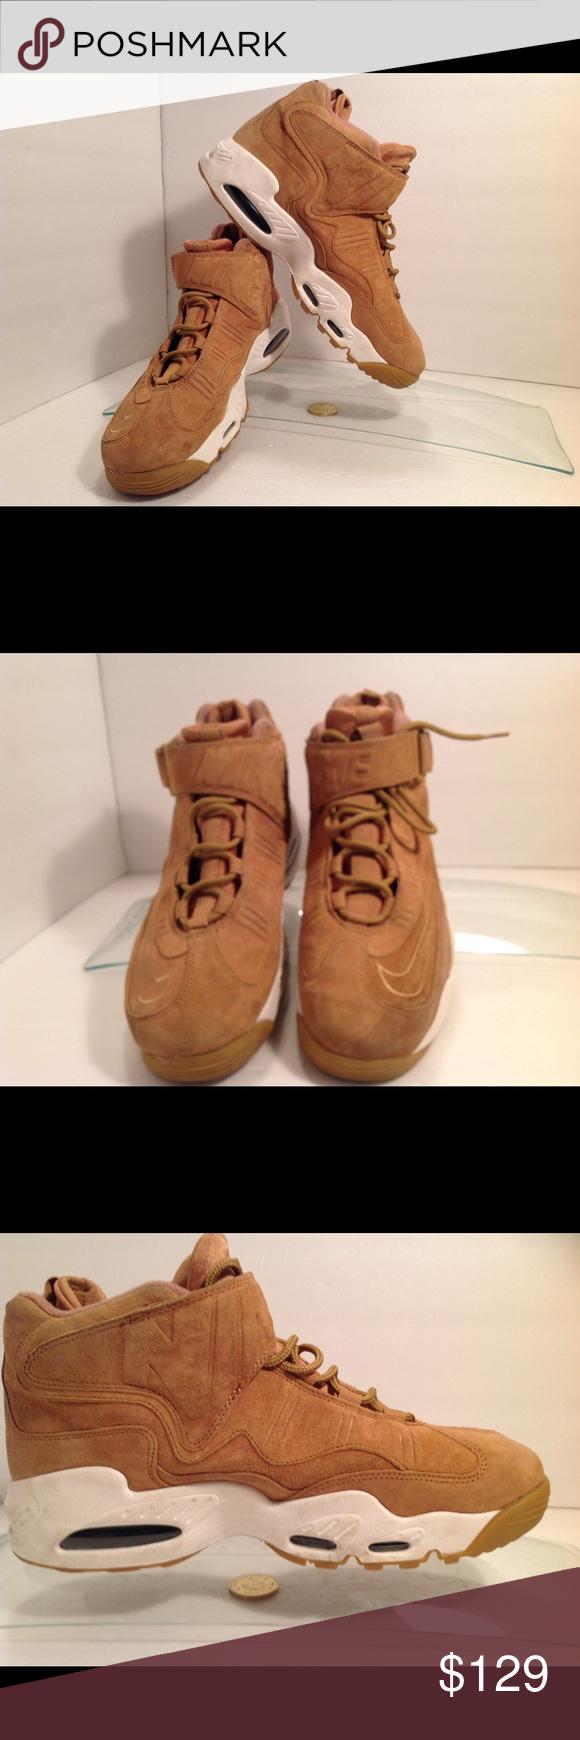 5 Wheat Size Air 11 1 Griffey Max Nike nOk8wX0P